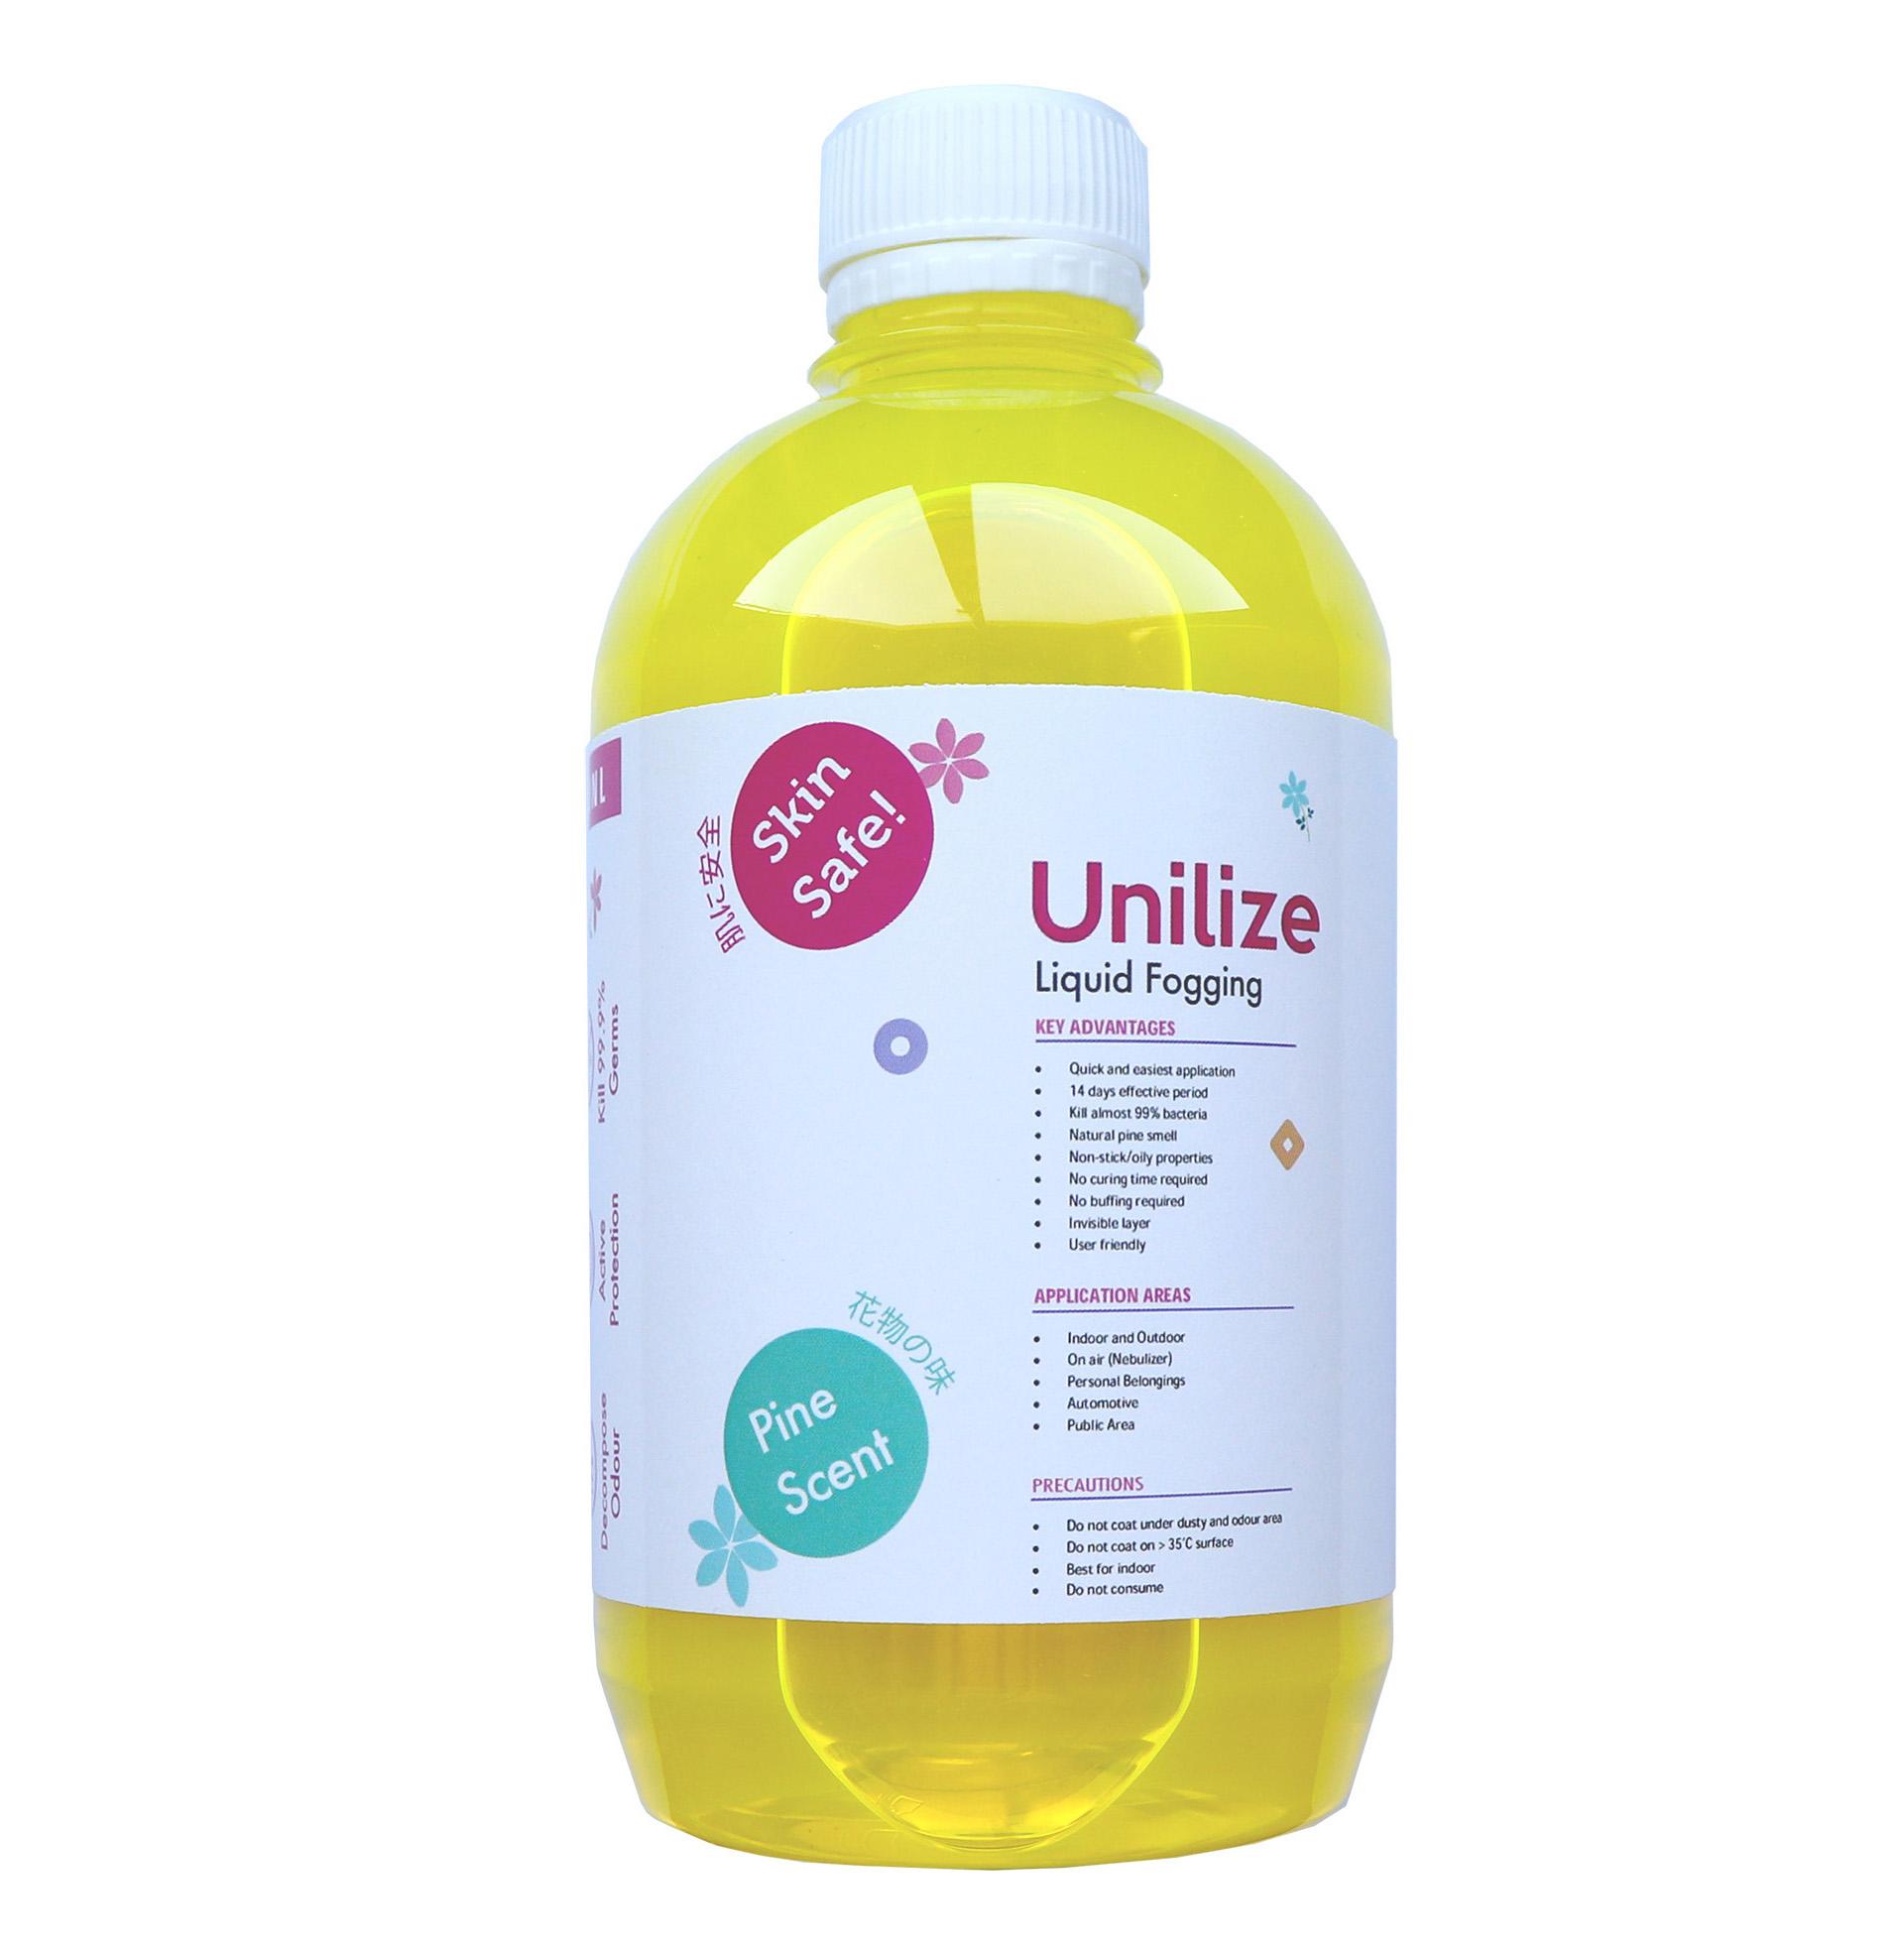 BerryC Unilize Liquid Fogging Smoke Disinfectant